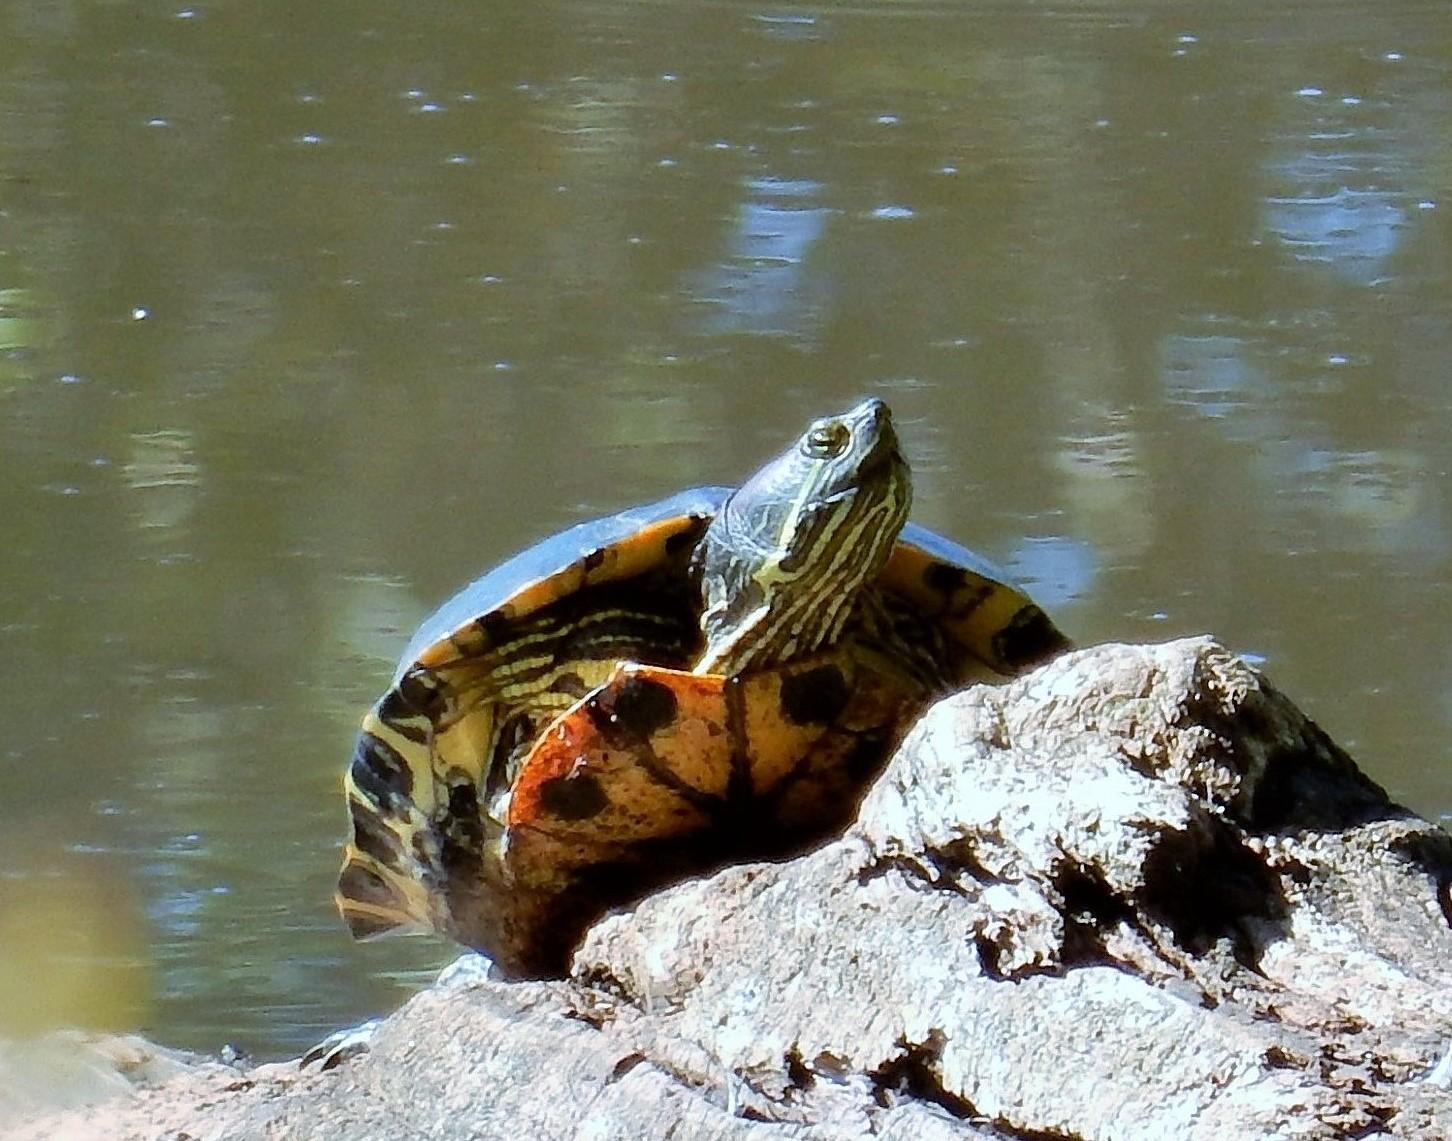 Turtle on Wander Nature